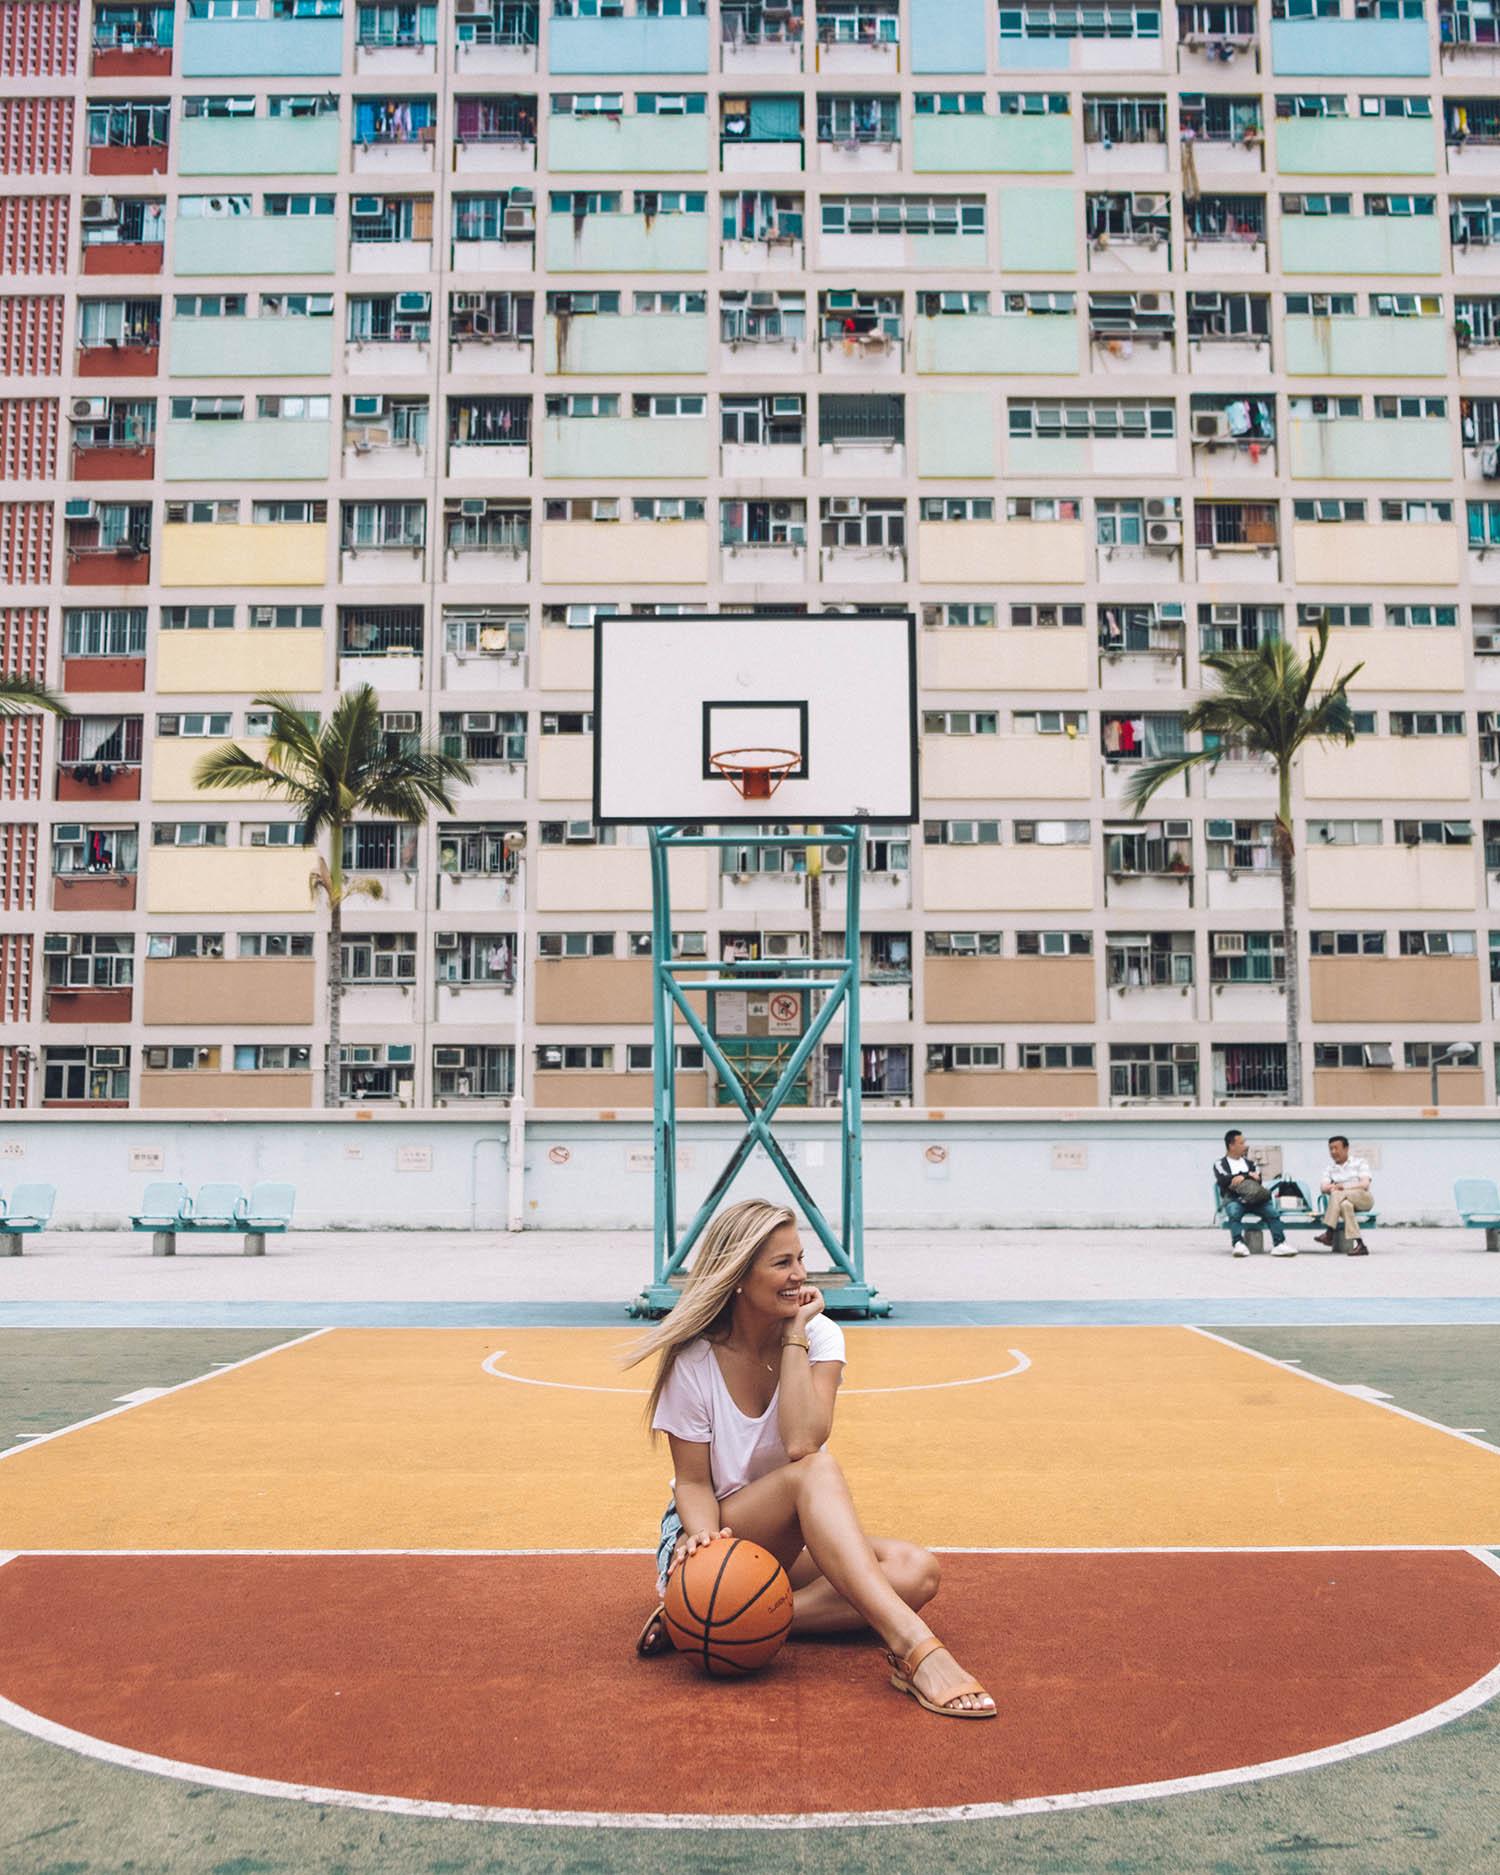 choi hung estate colorful basketball court hong kong girl